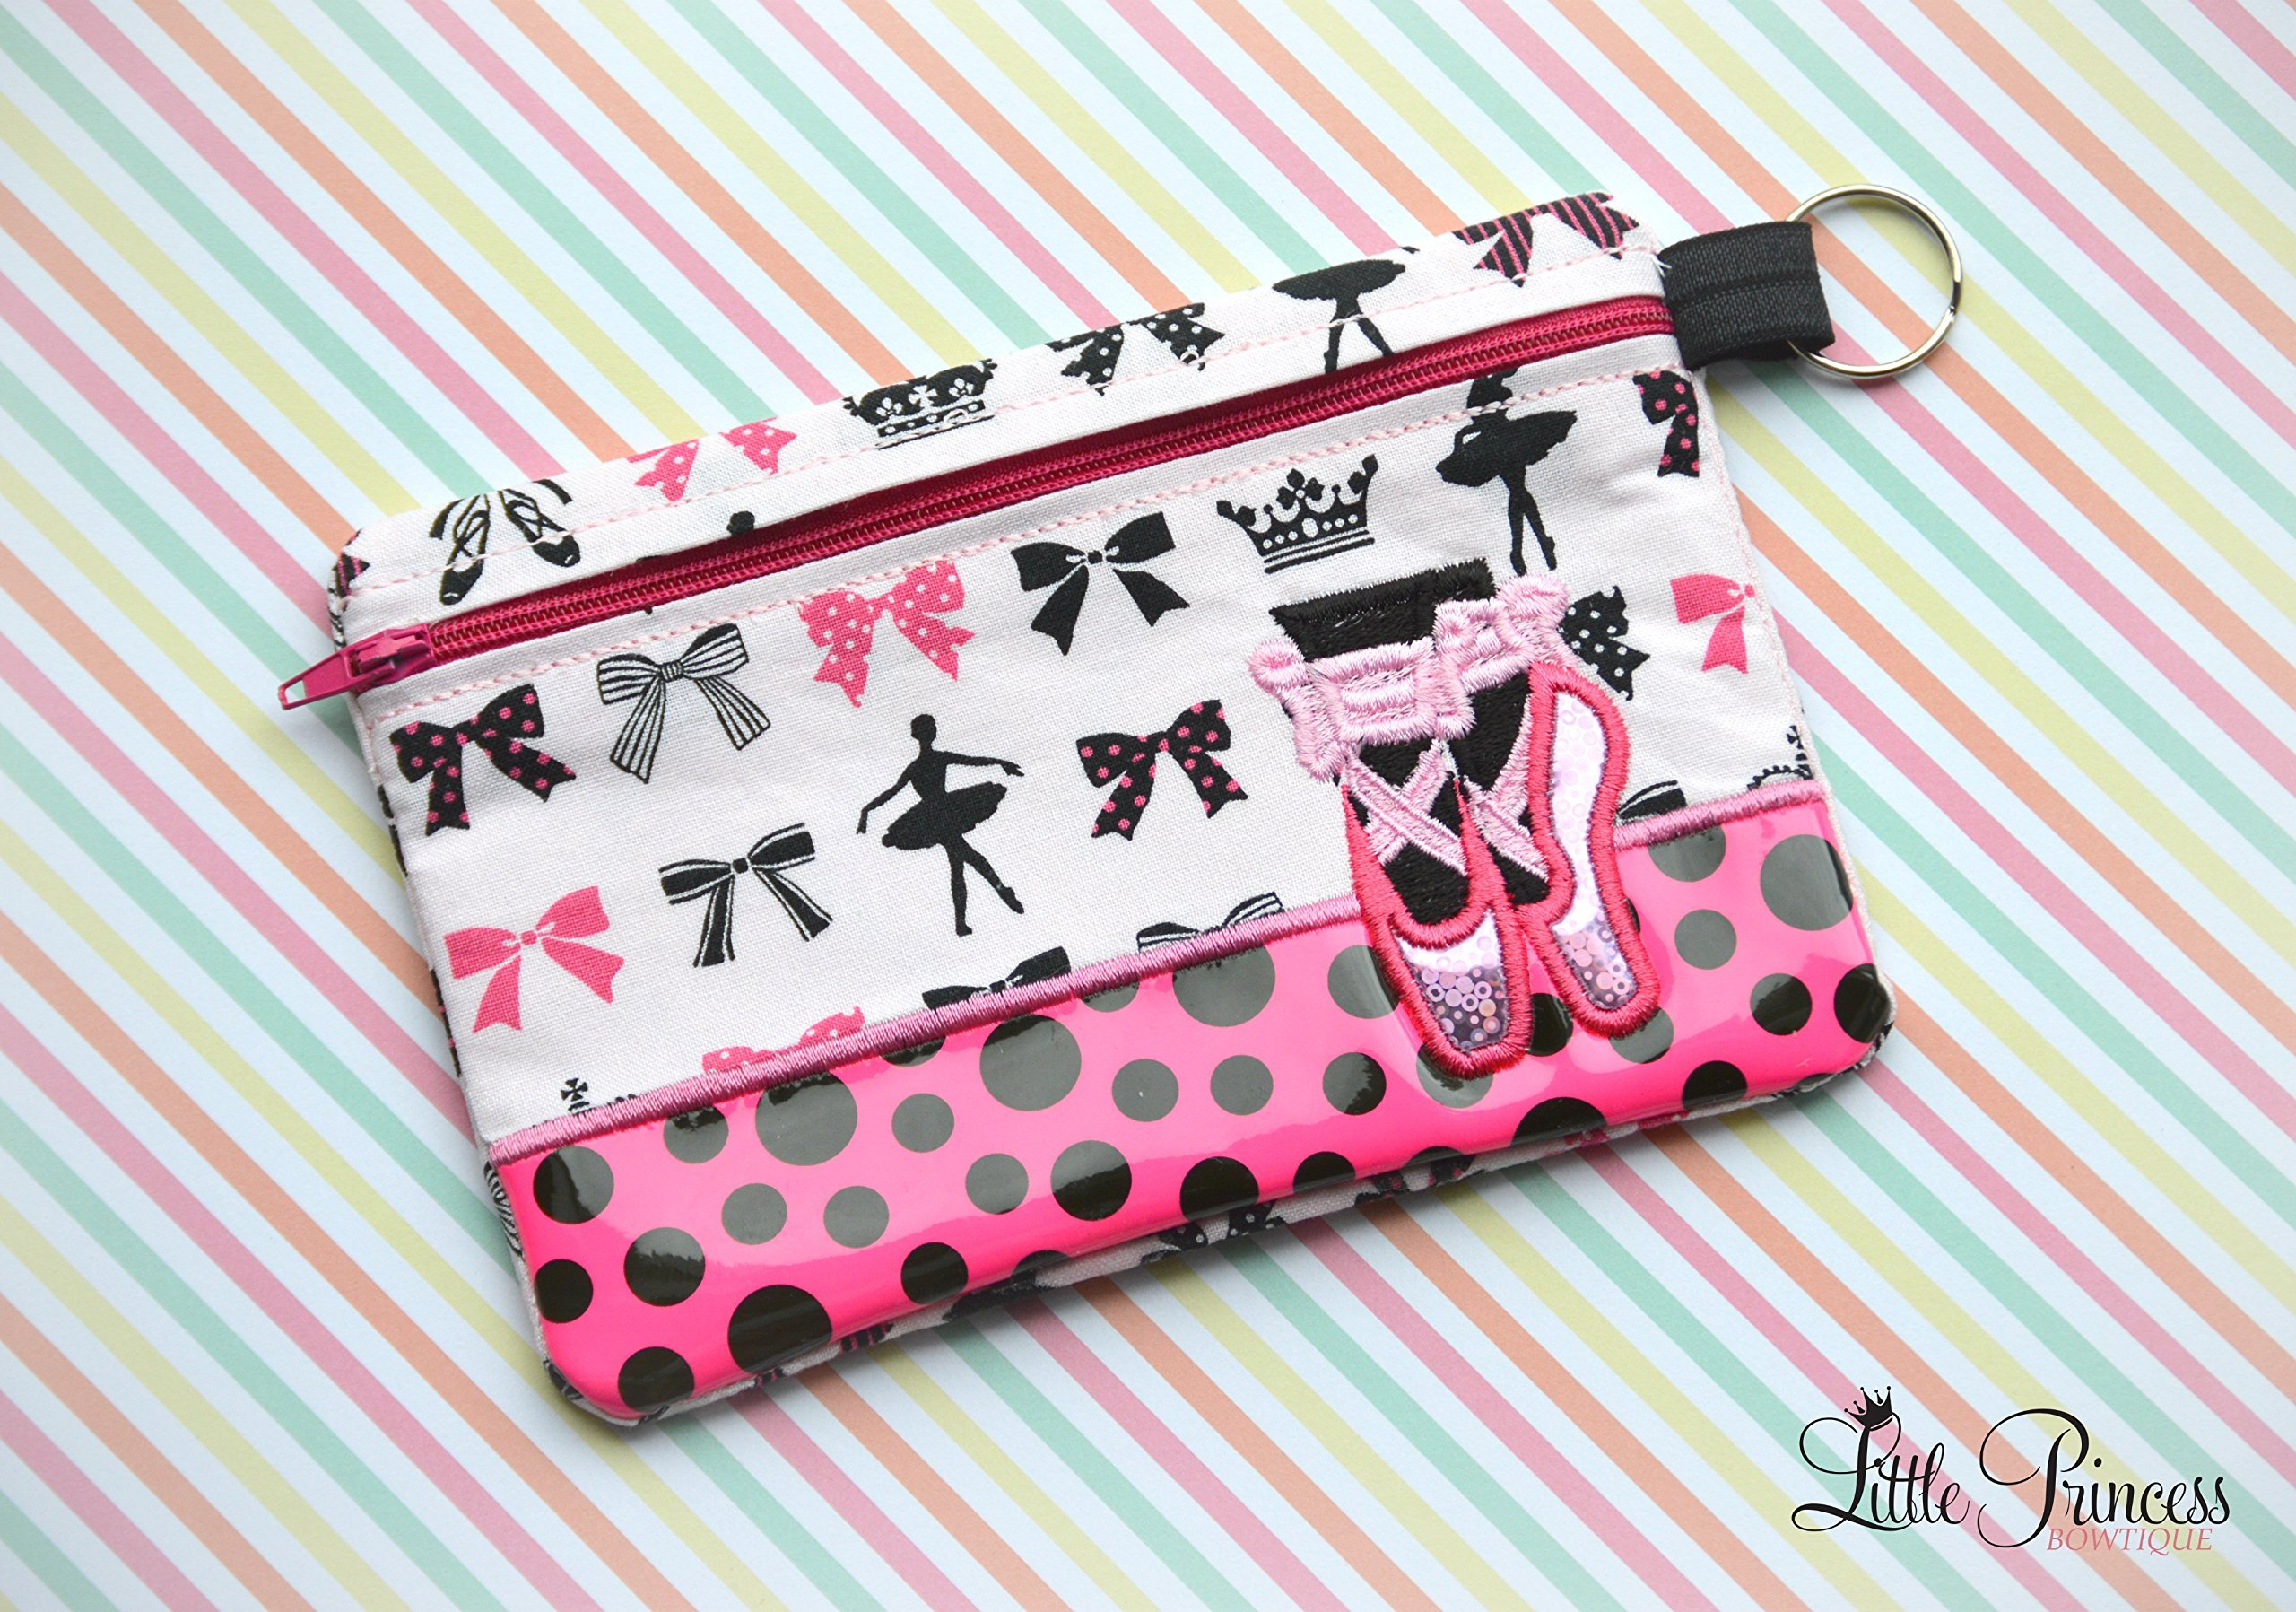 Ballerina Bag, Cosmetic Bag, Toiletry Bag. by Little Princess Bowtique